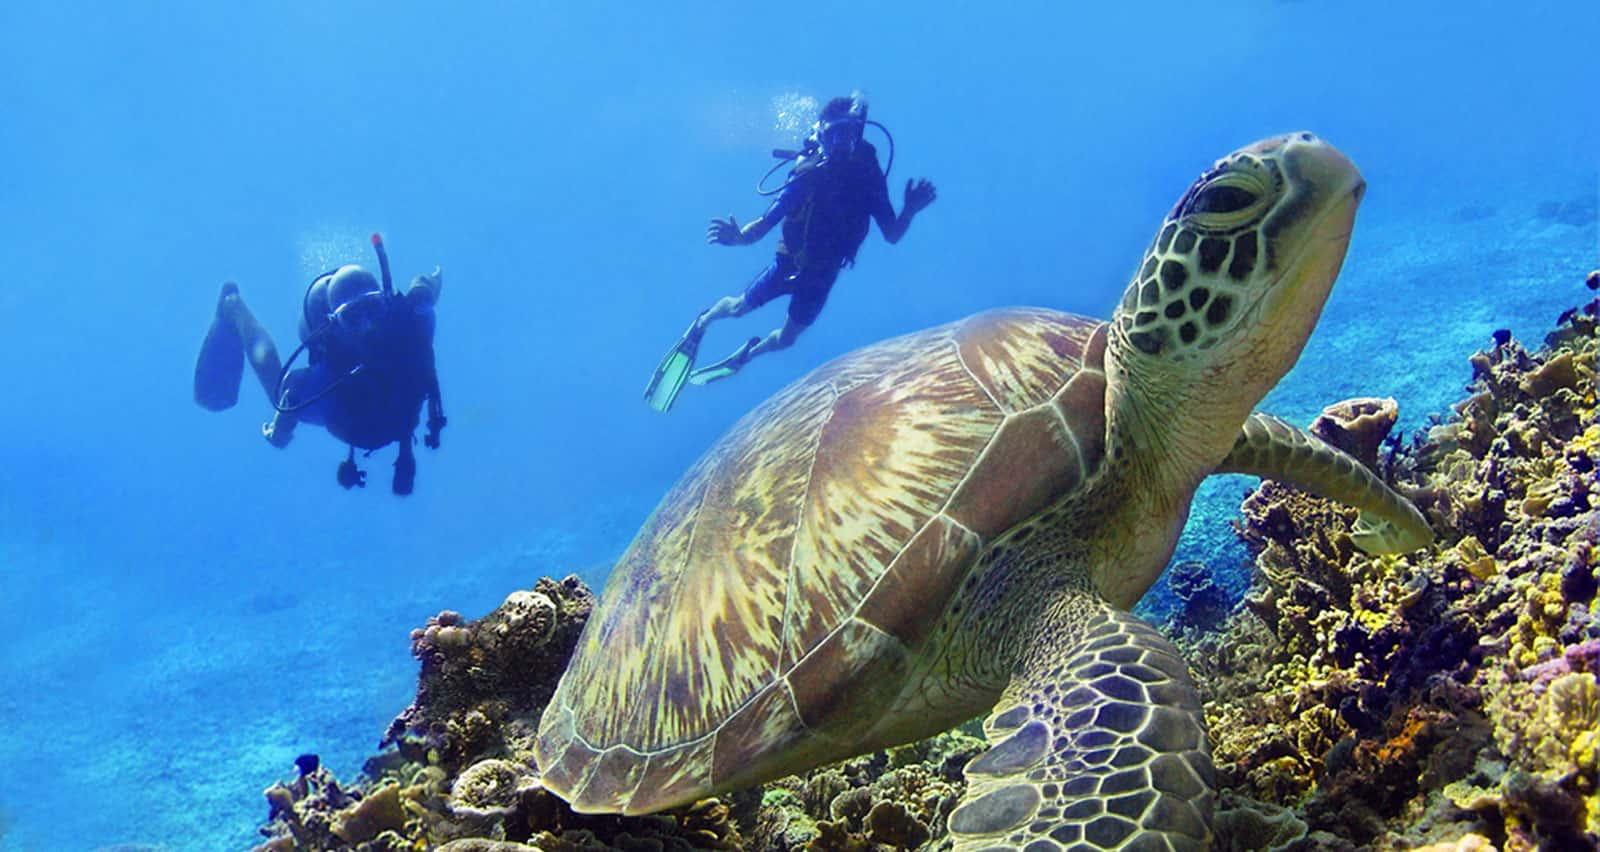 Gili Islands, Indonesia